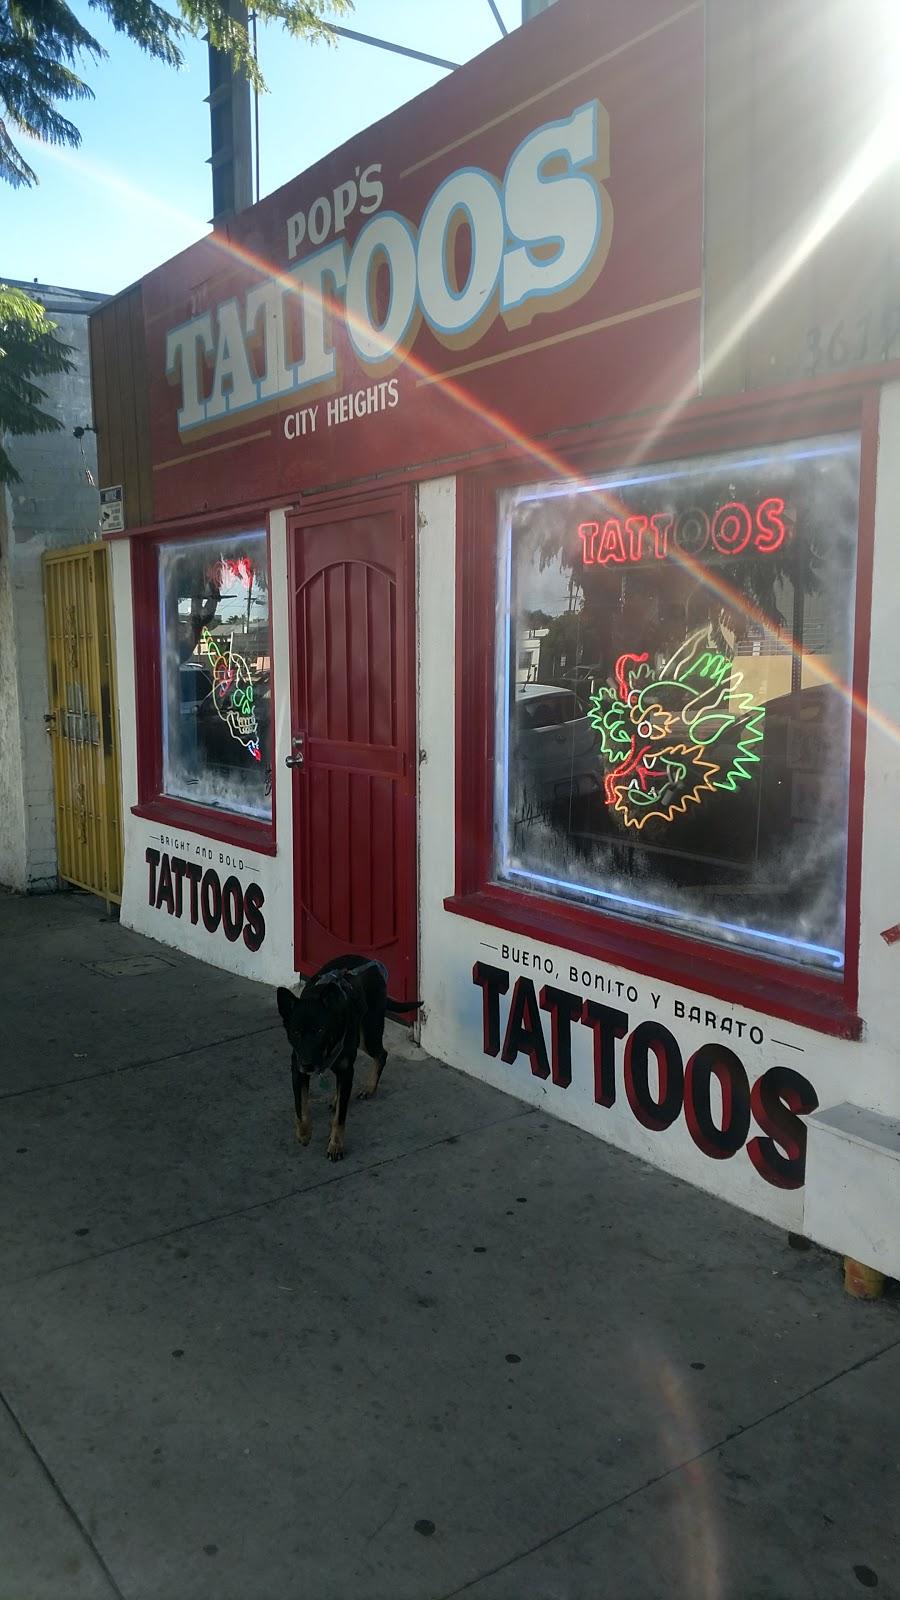 Pops Tattoos - store    Photo 4 of 4   Address: 3679 University Ave, San Diego, CA 92104, USA   Phone: (619) 788-7300